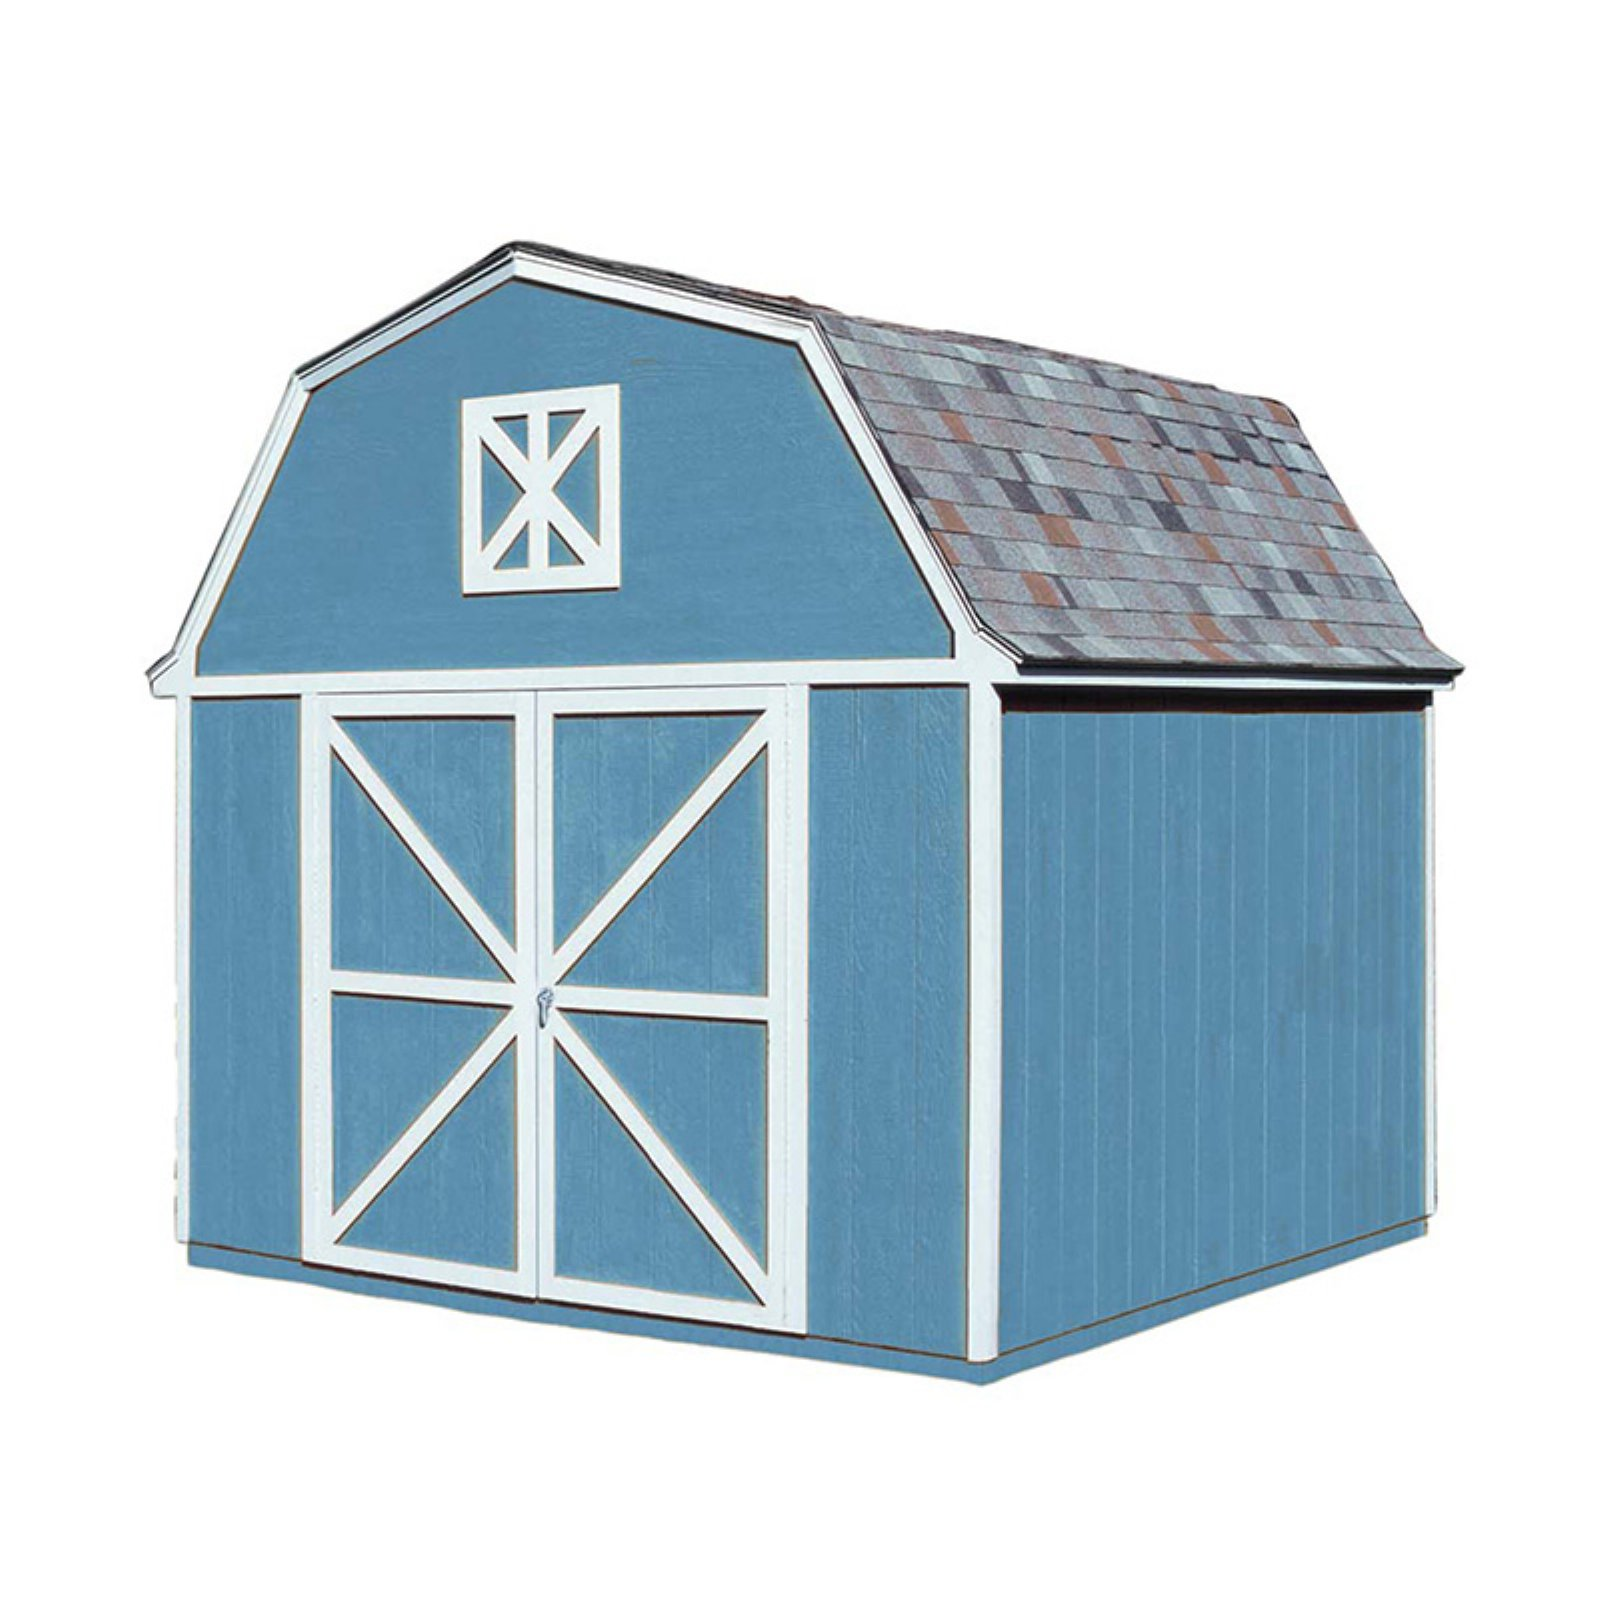 Handy Home Berkley Storage Shed - 10 x 10 ft.